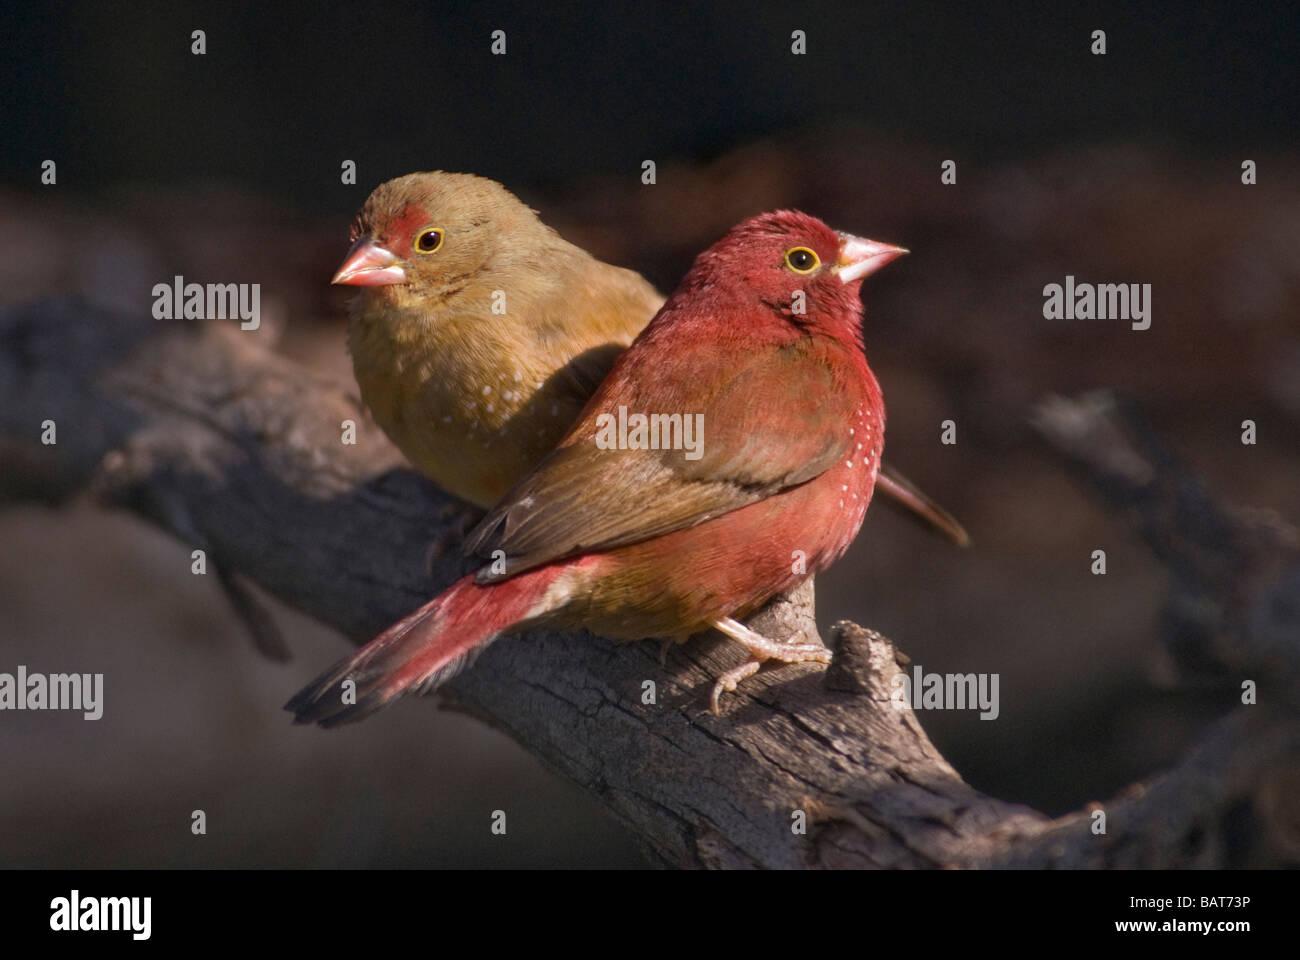 Red-billed Firefinch pair 'Lagonosticta senegala' Stock Photo